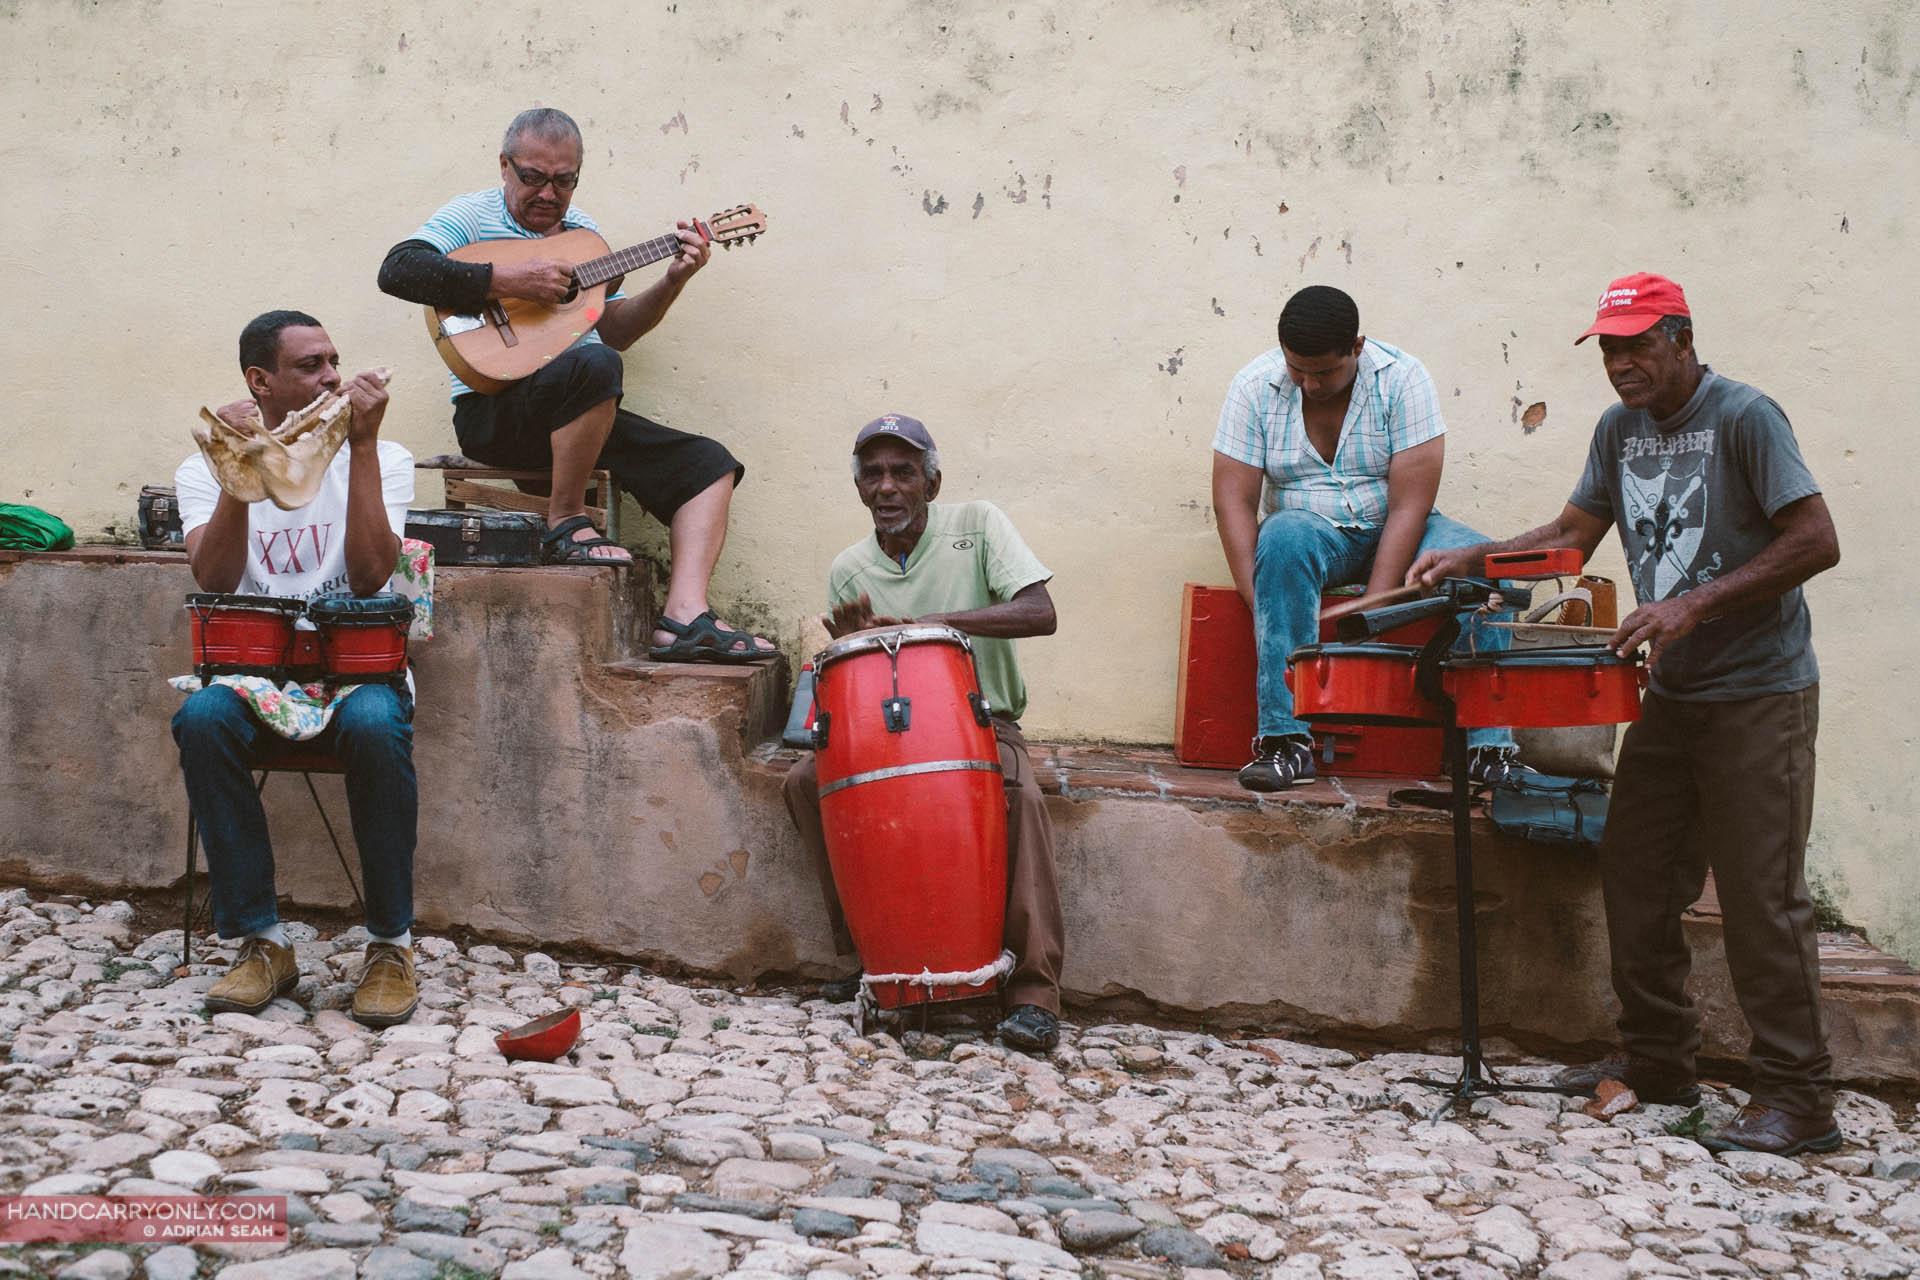 cuban musicians on the street